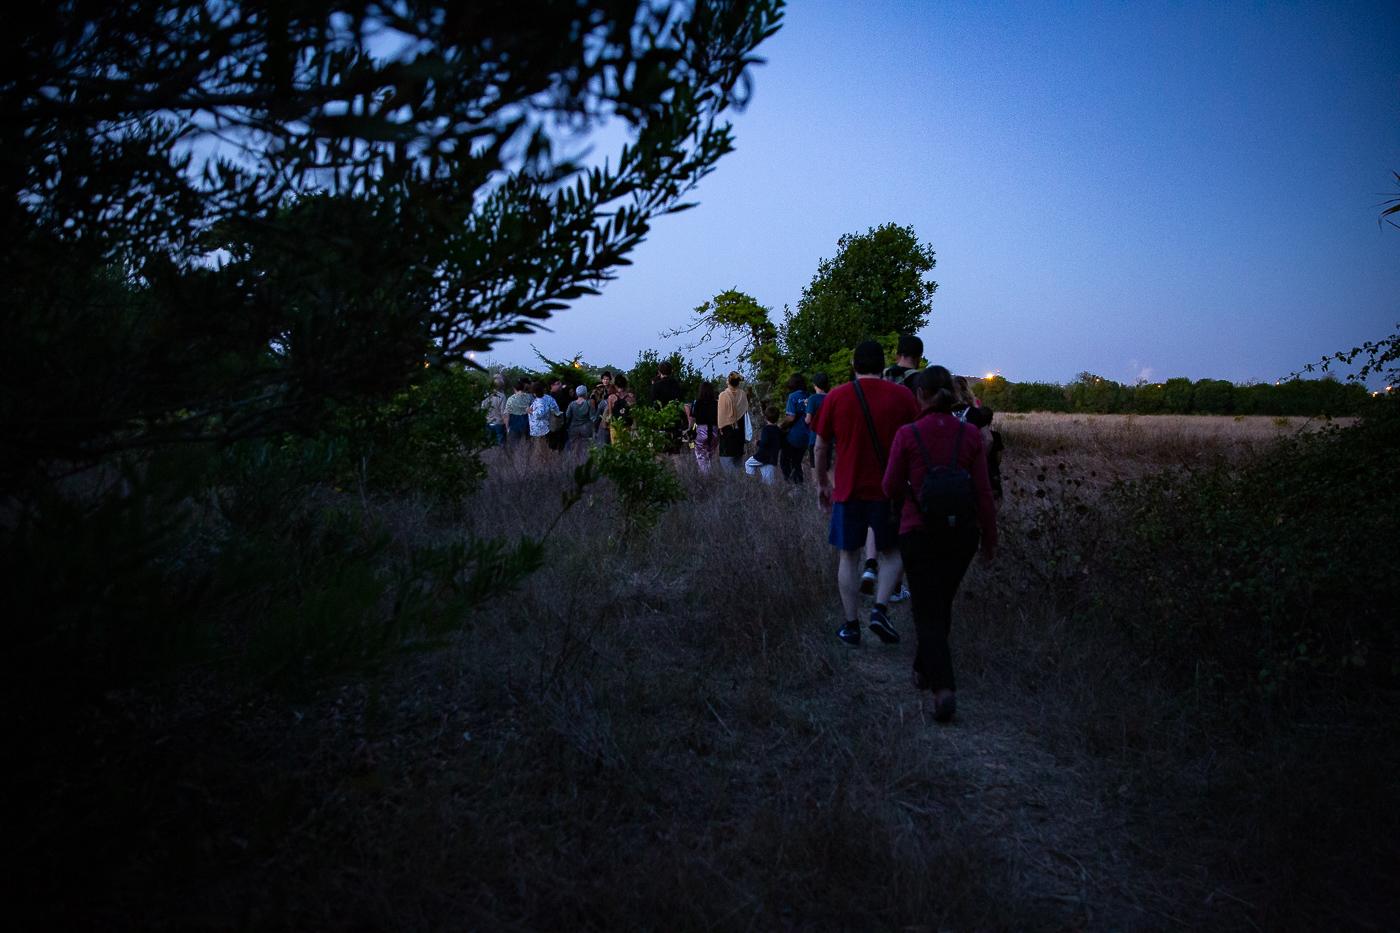 ohtli en MAR 2018 (Sines, Portugal) - Foto de Alípio Padilha6.jpg